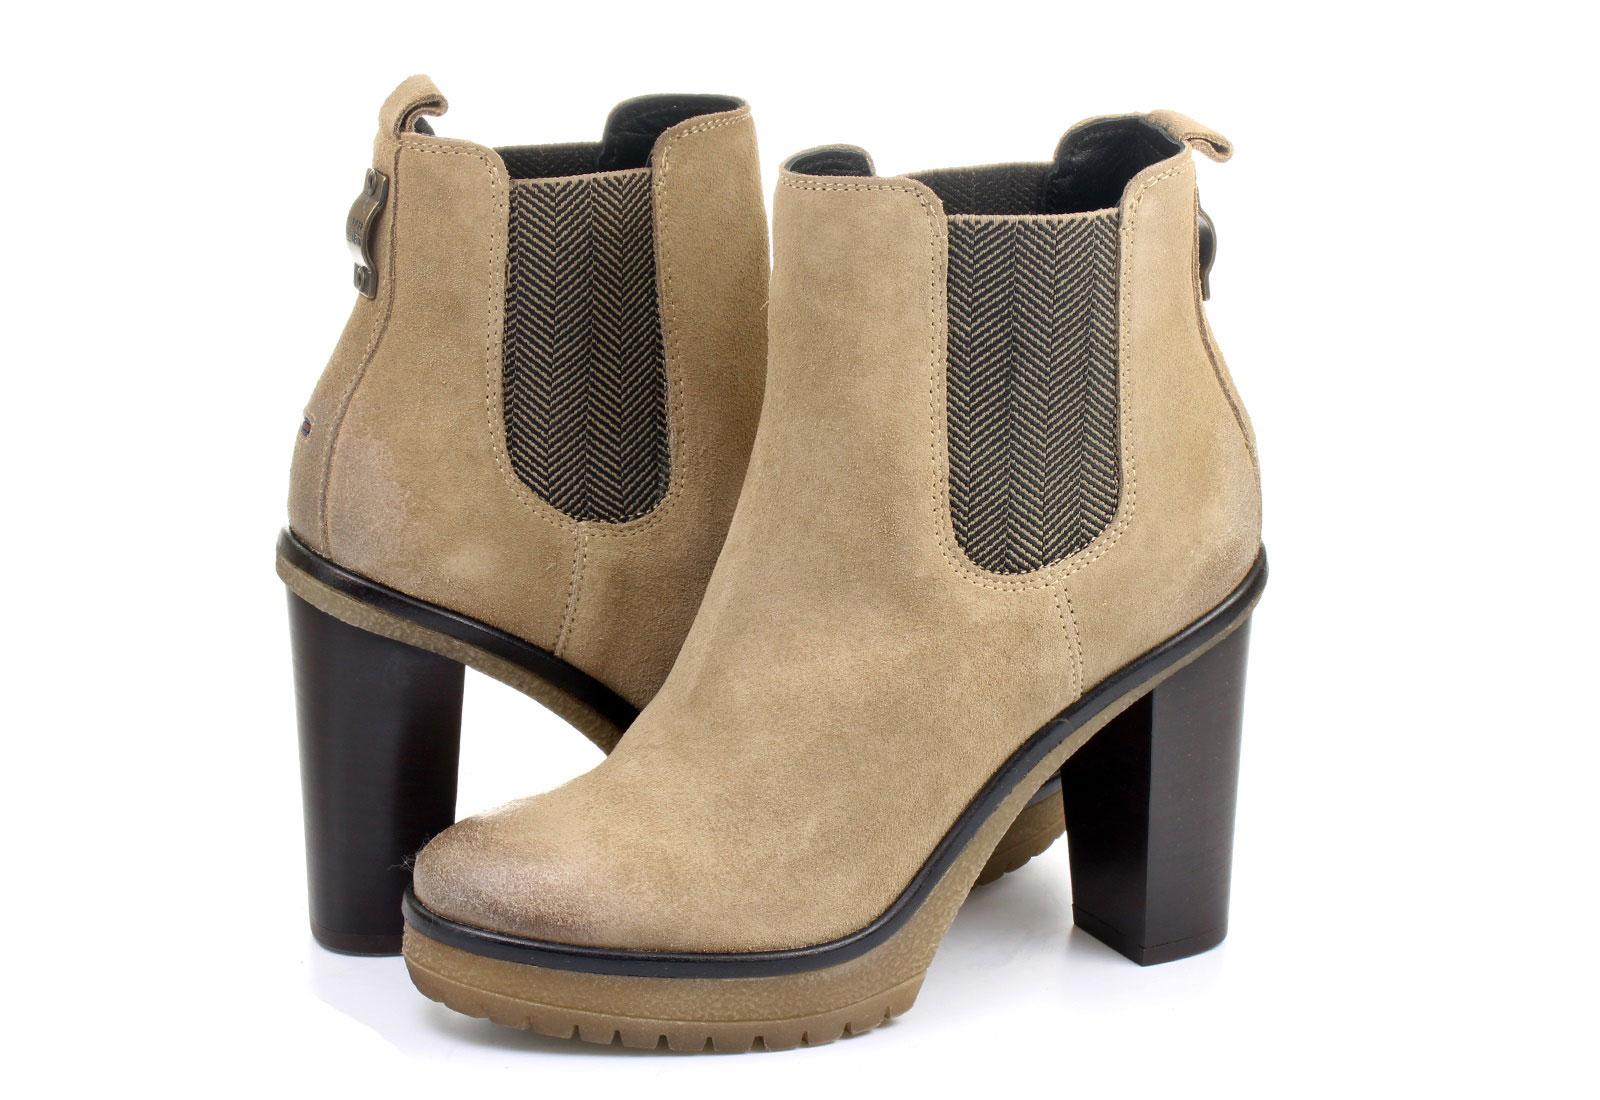 Tommy Hilfiger Csizma - Cleo 1b - 16F-1966-255 - Office Shoes ... 6a3ec3f419